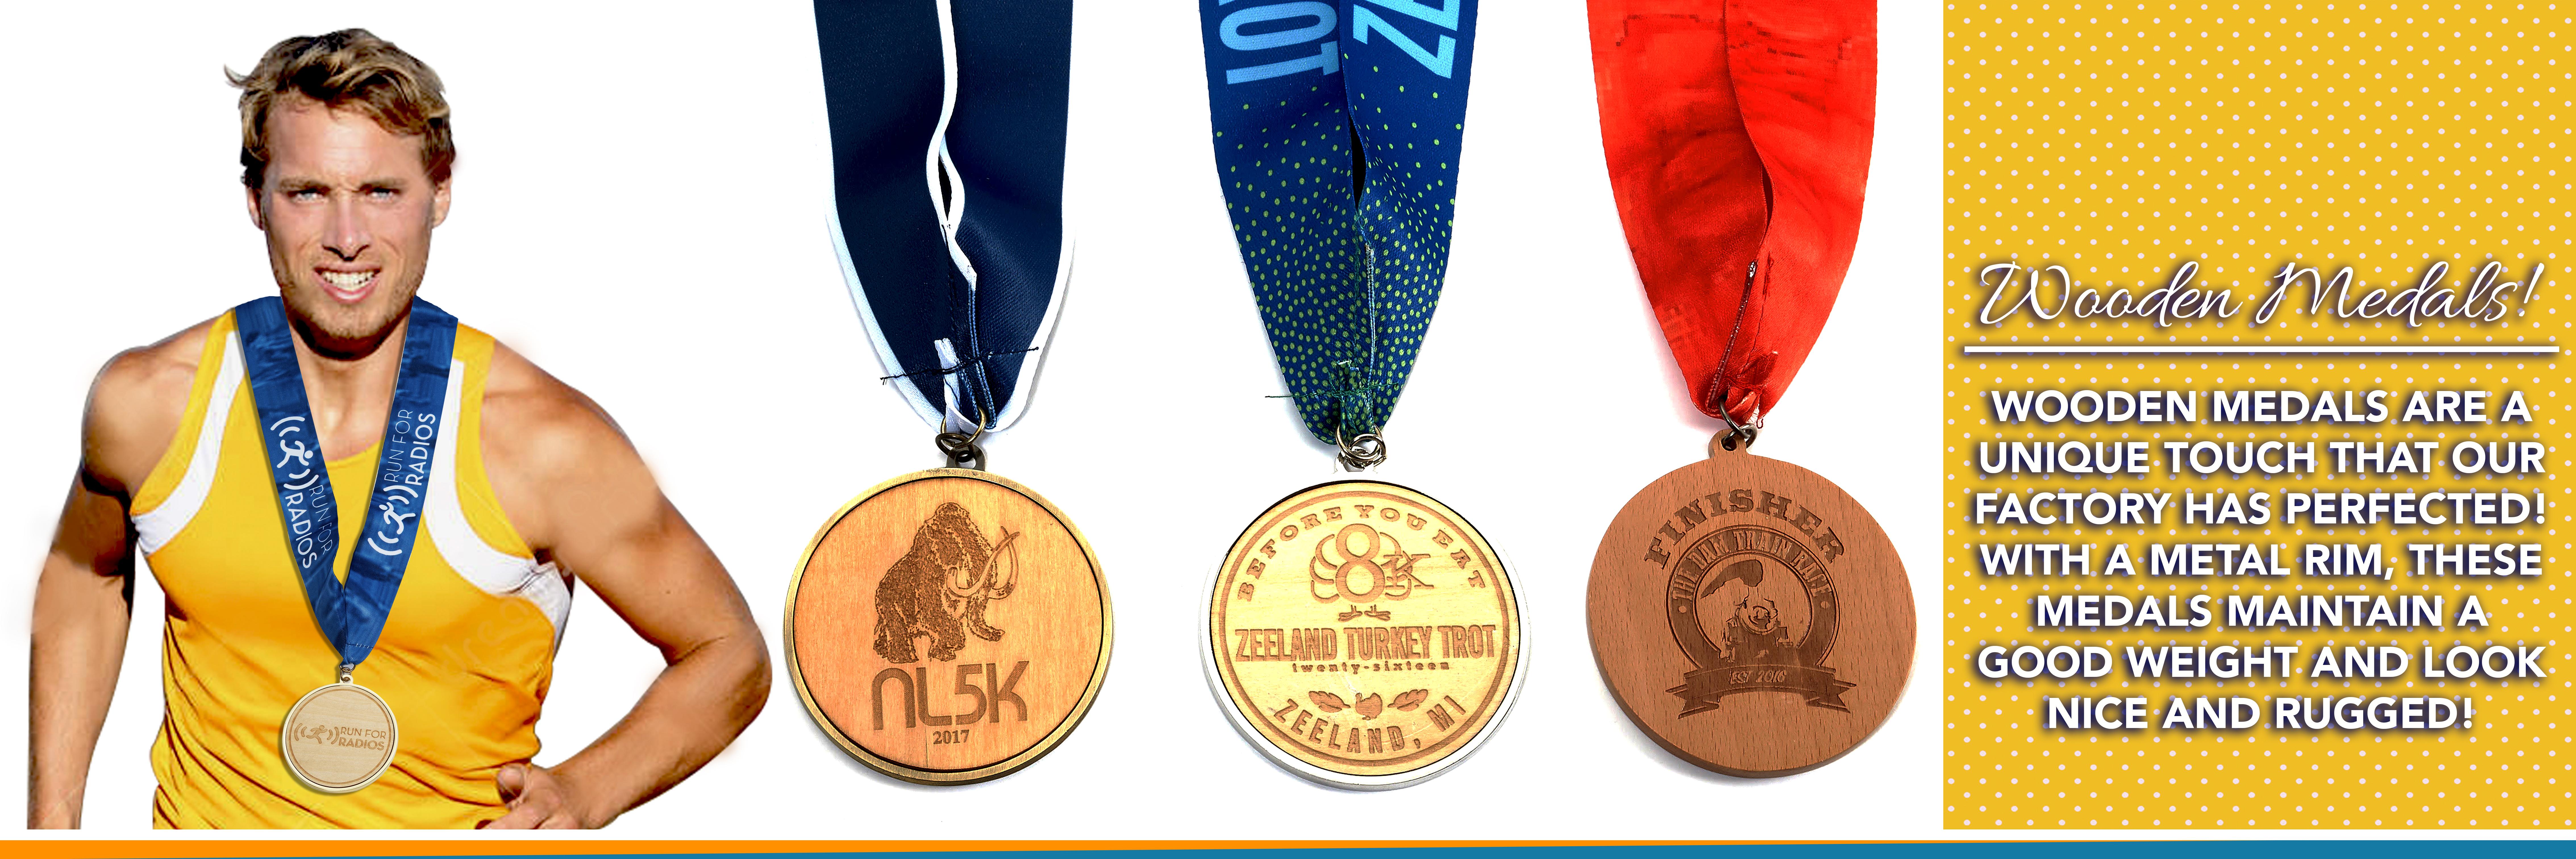 Wood Race Medals - Custom Finisher Medals For Marathon